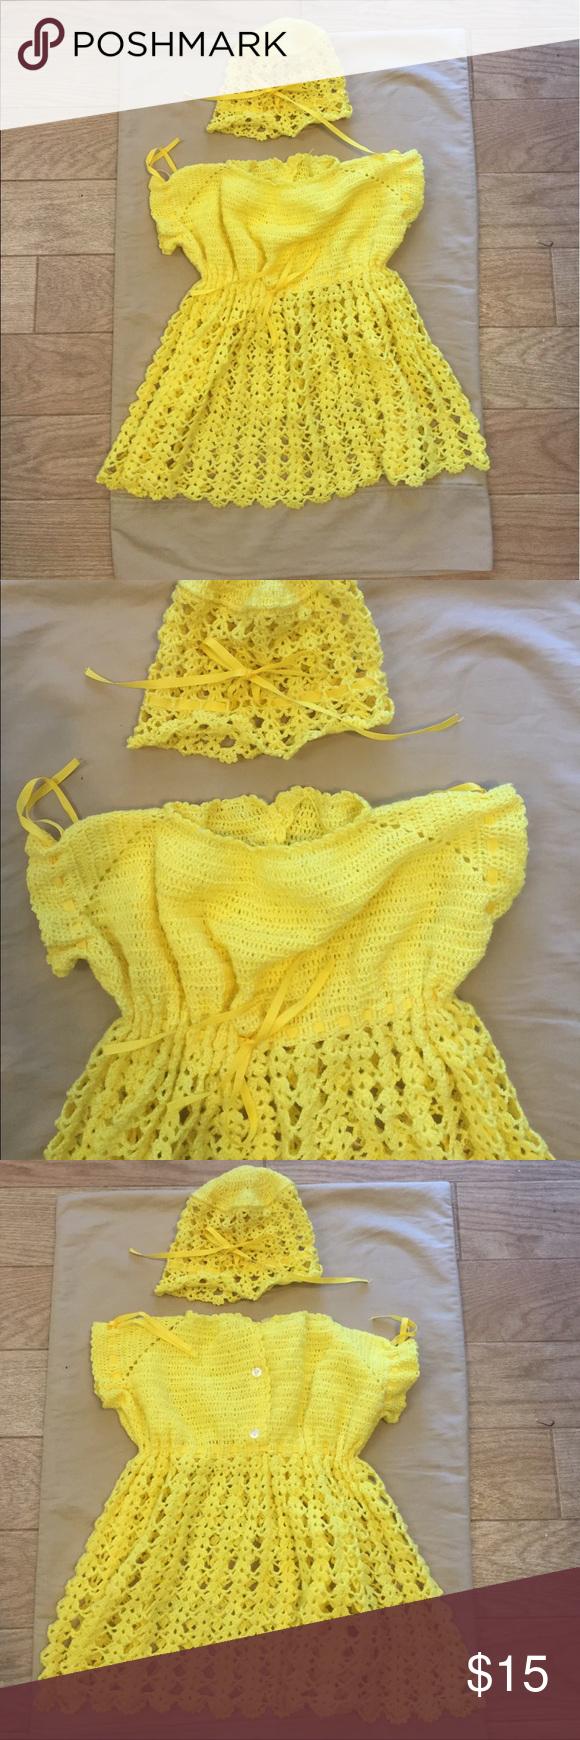 Round Base Crocheted Goody Bag - Free Patterns | horgolás ...